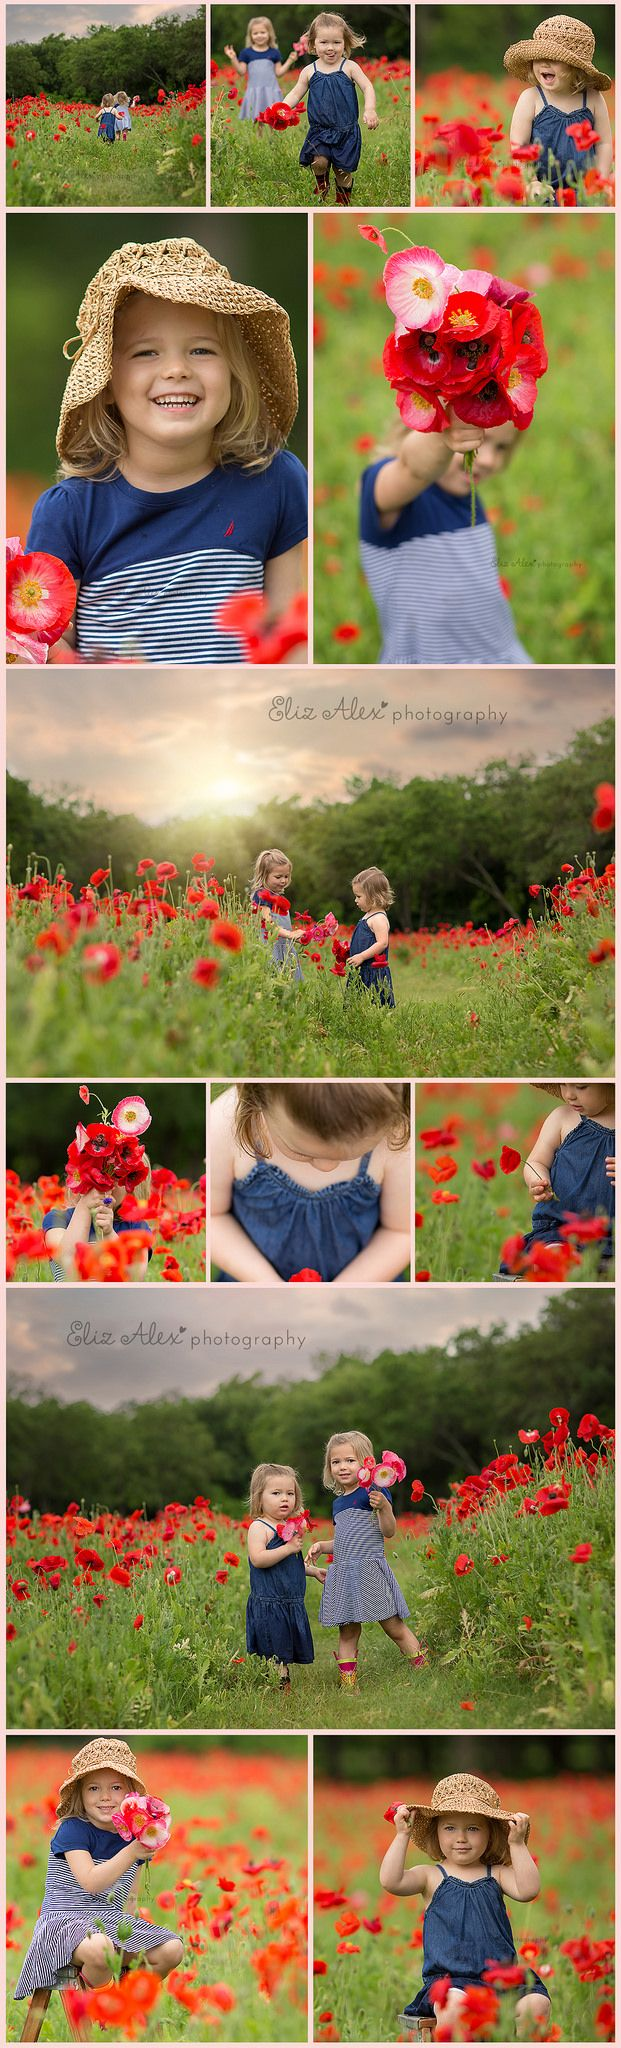 Shhh rain rain go away . . . red poppy field - The Woodlands Texas child and family photographer,  Tomball Texas photographer, Magnolia, Texas photographer